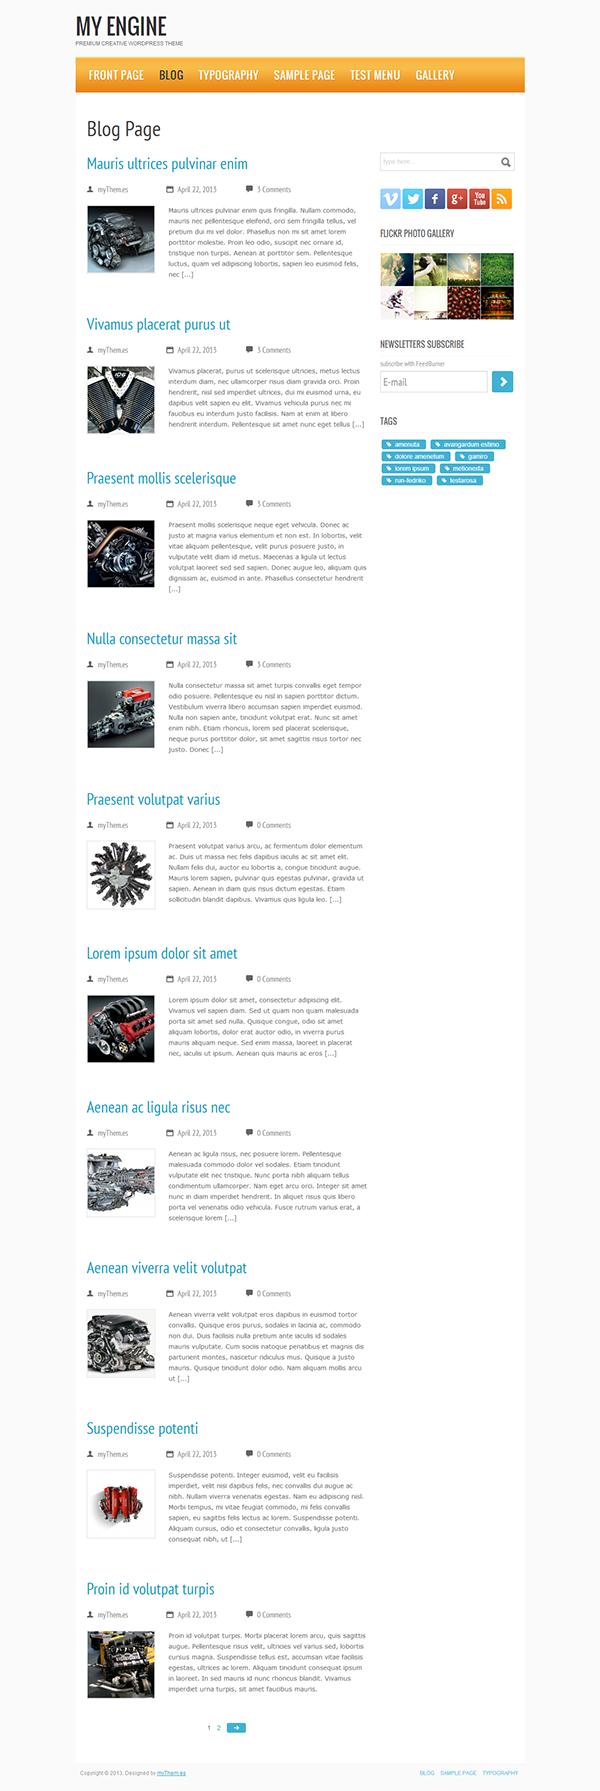 My Engine Free WordPress Theme